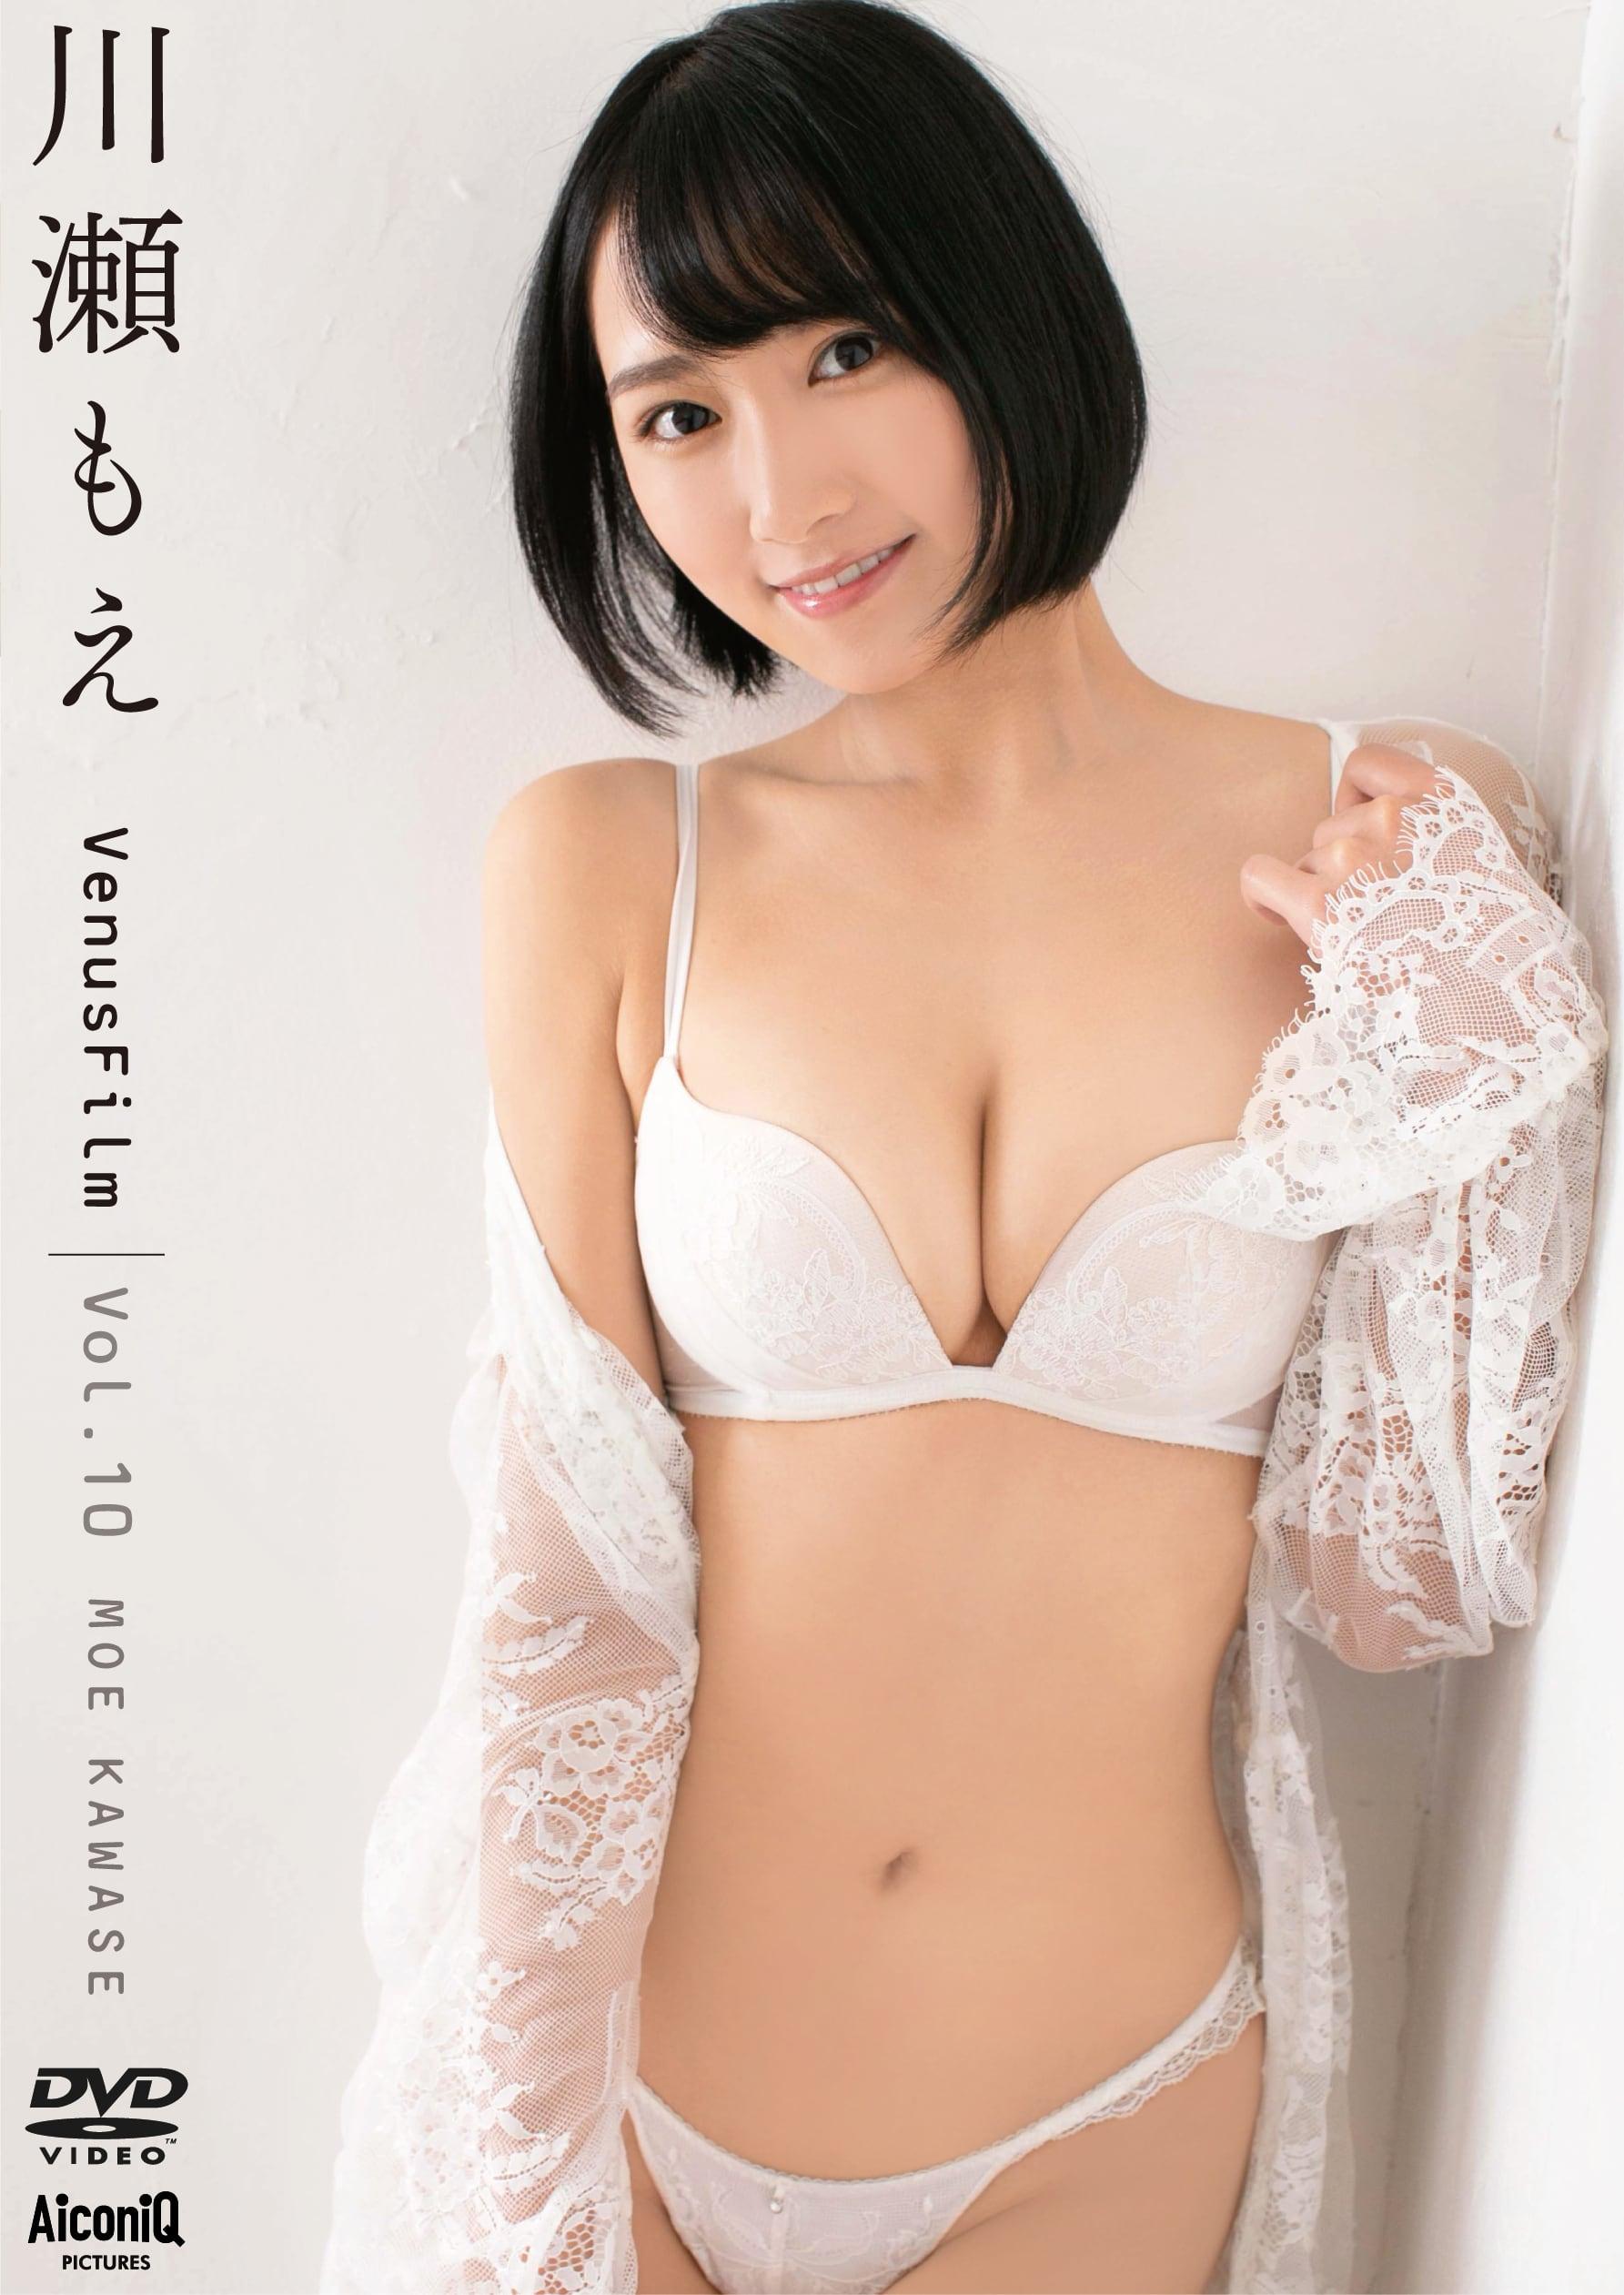 【DVD】川瀬もえ/VenusFilm Vol.10【AIPI-0031】特別ブロマイド3枚付